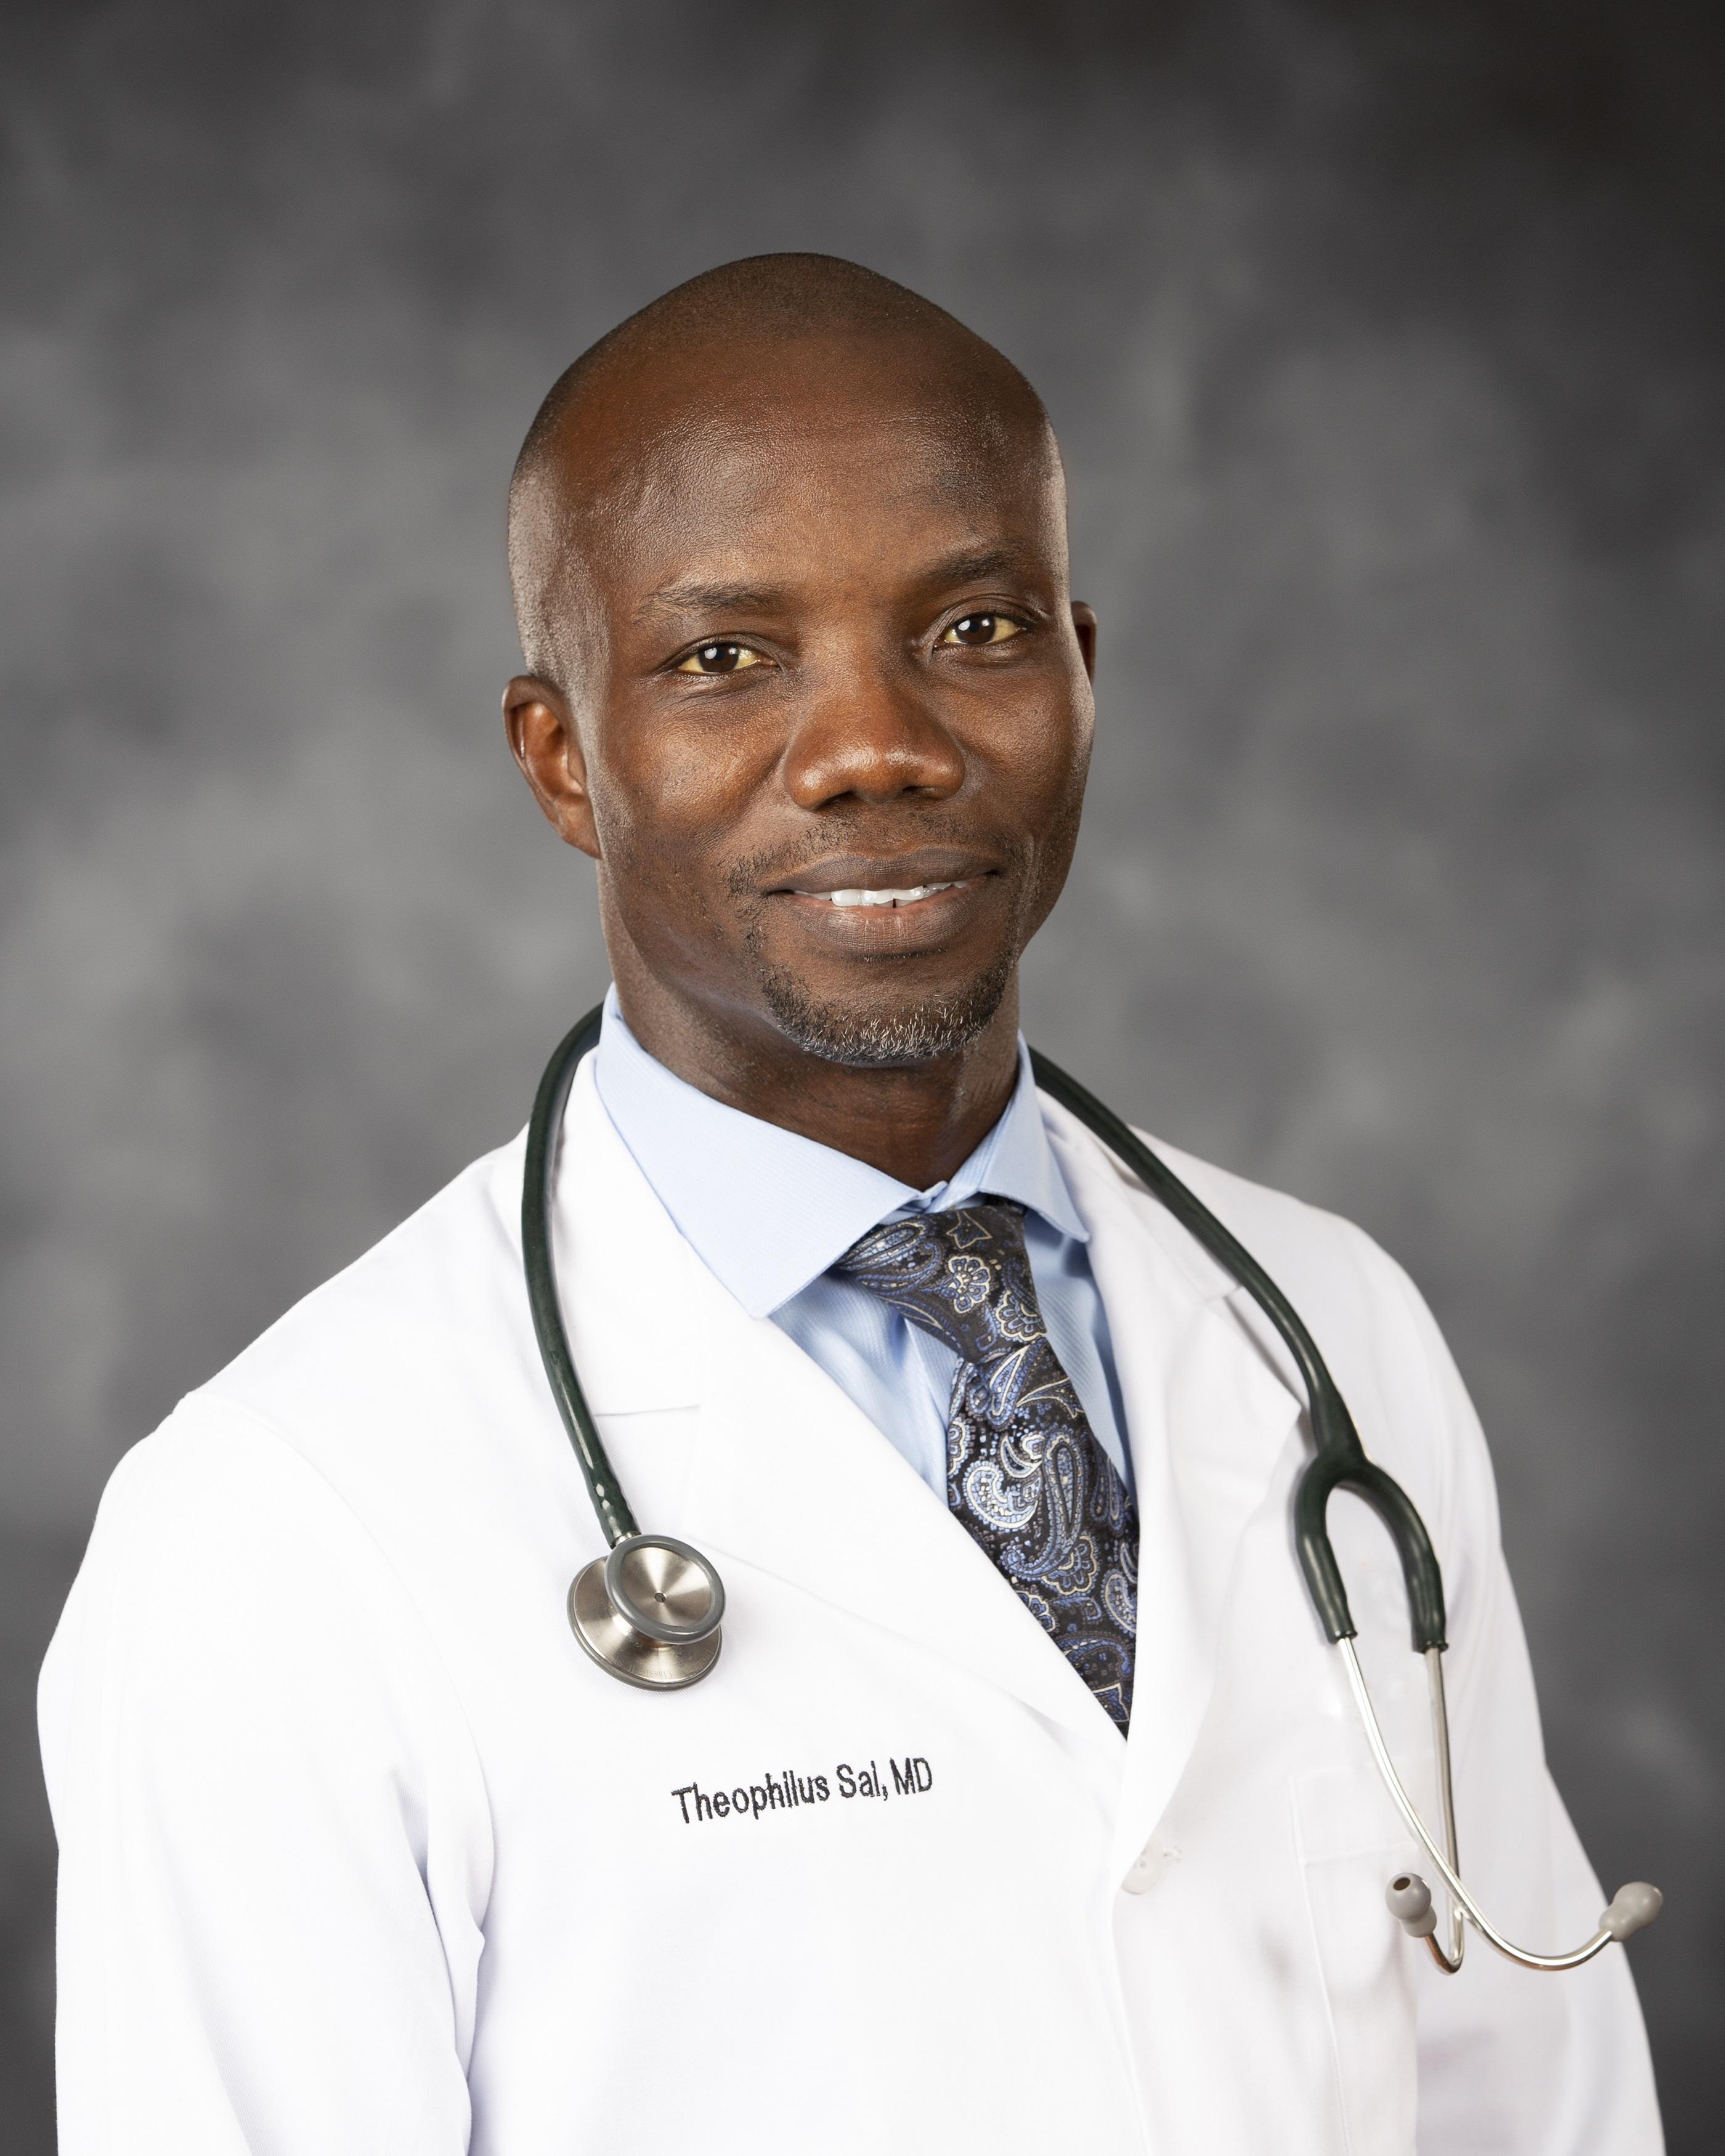 East Tampa Doctor Targets SeniorsIn Community